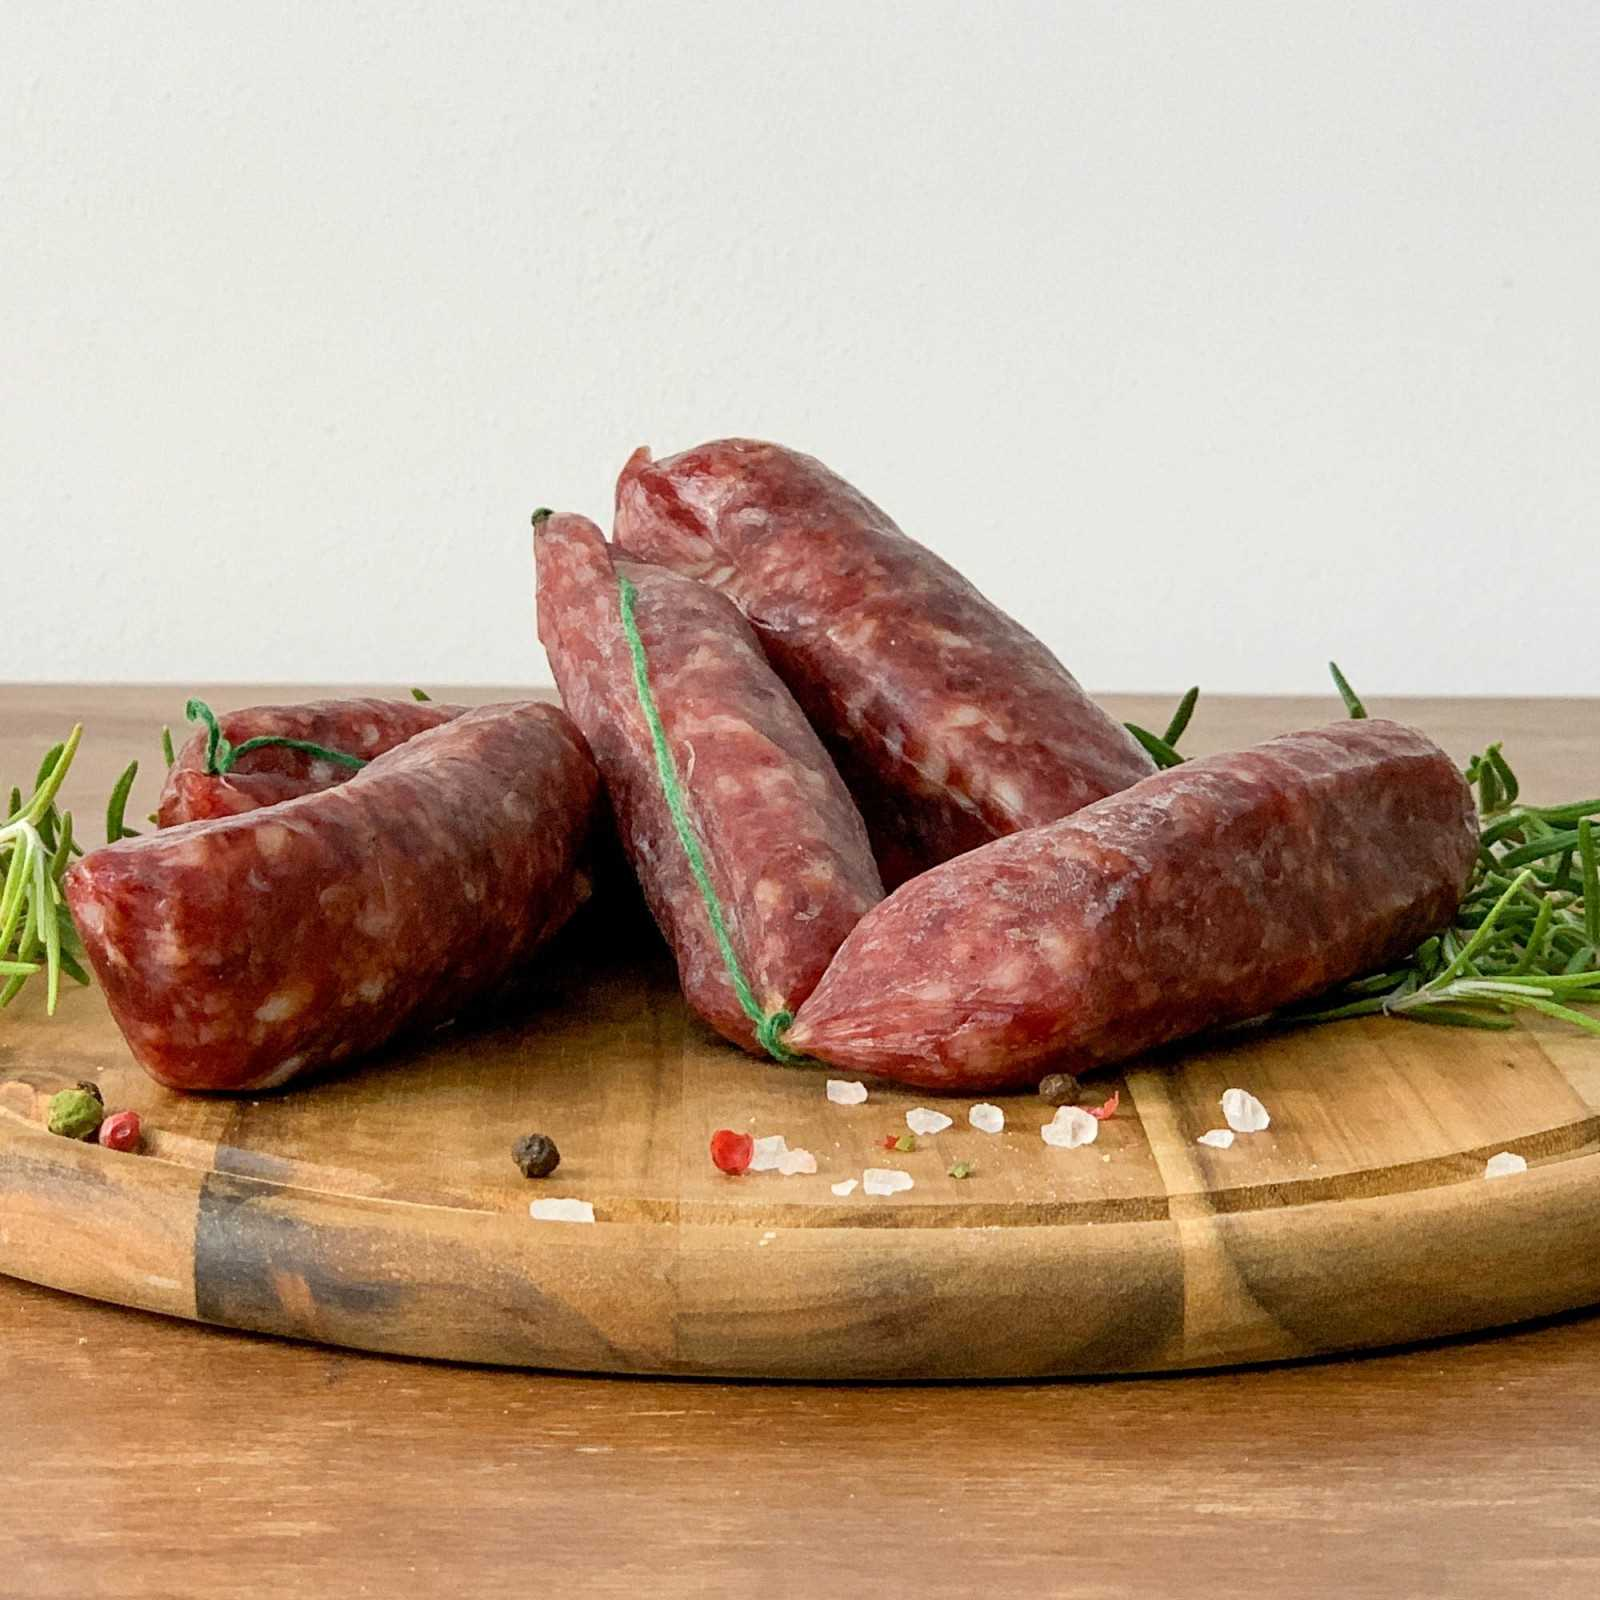 Cured Cinta Senese PDO Pork Sausage.